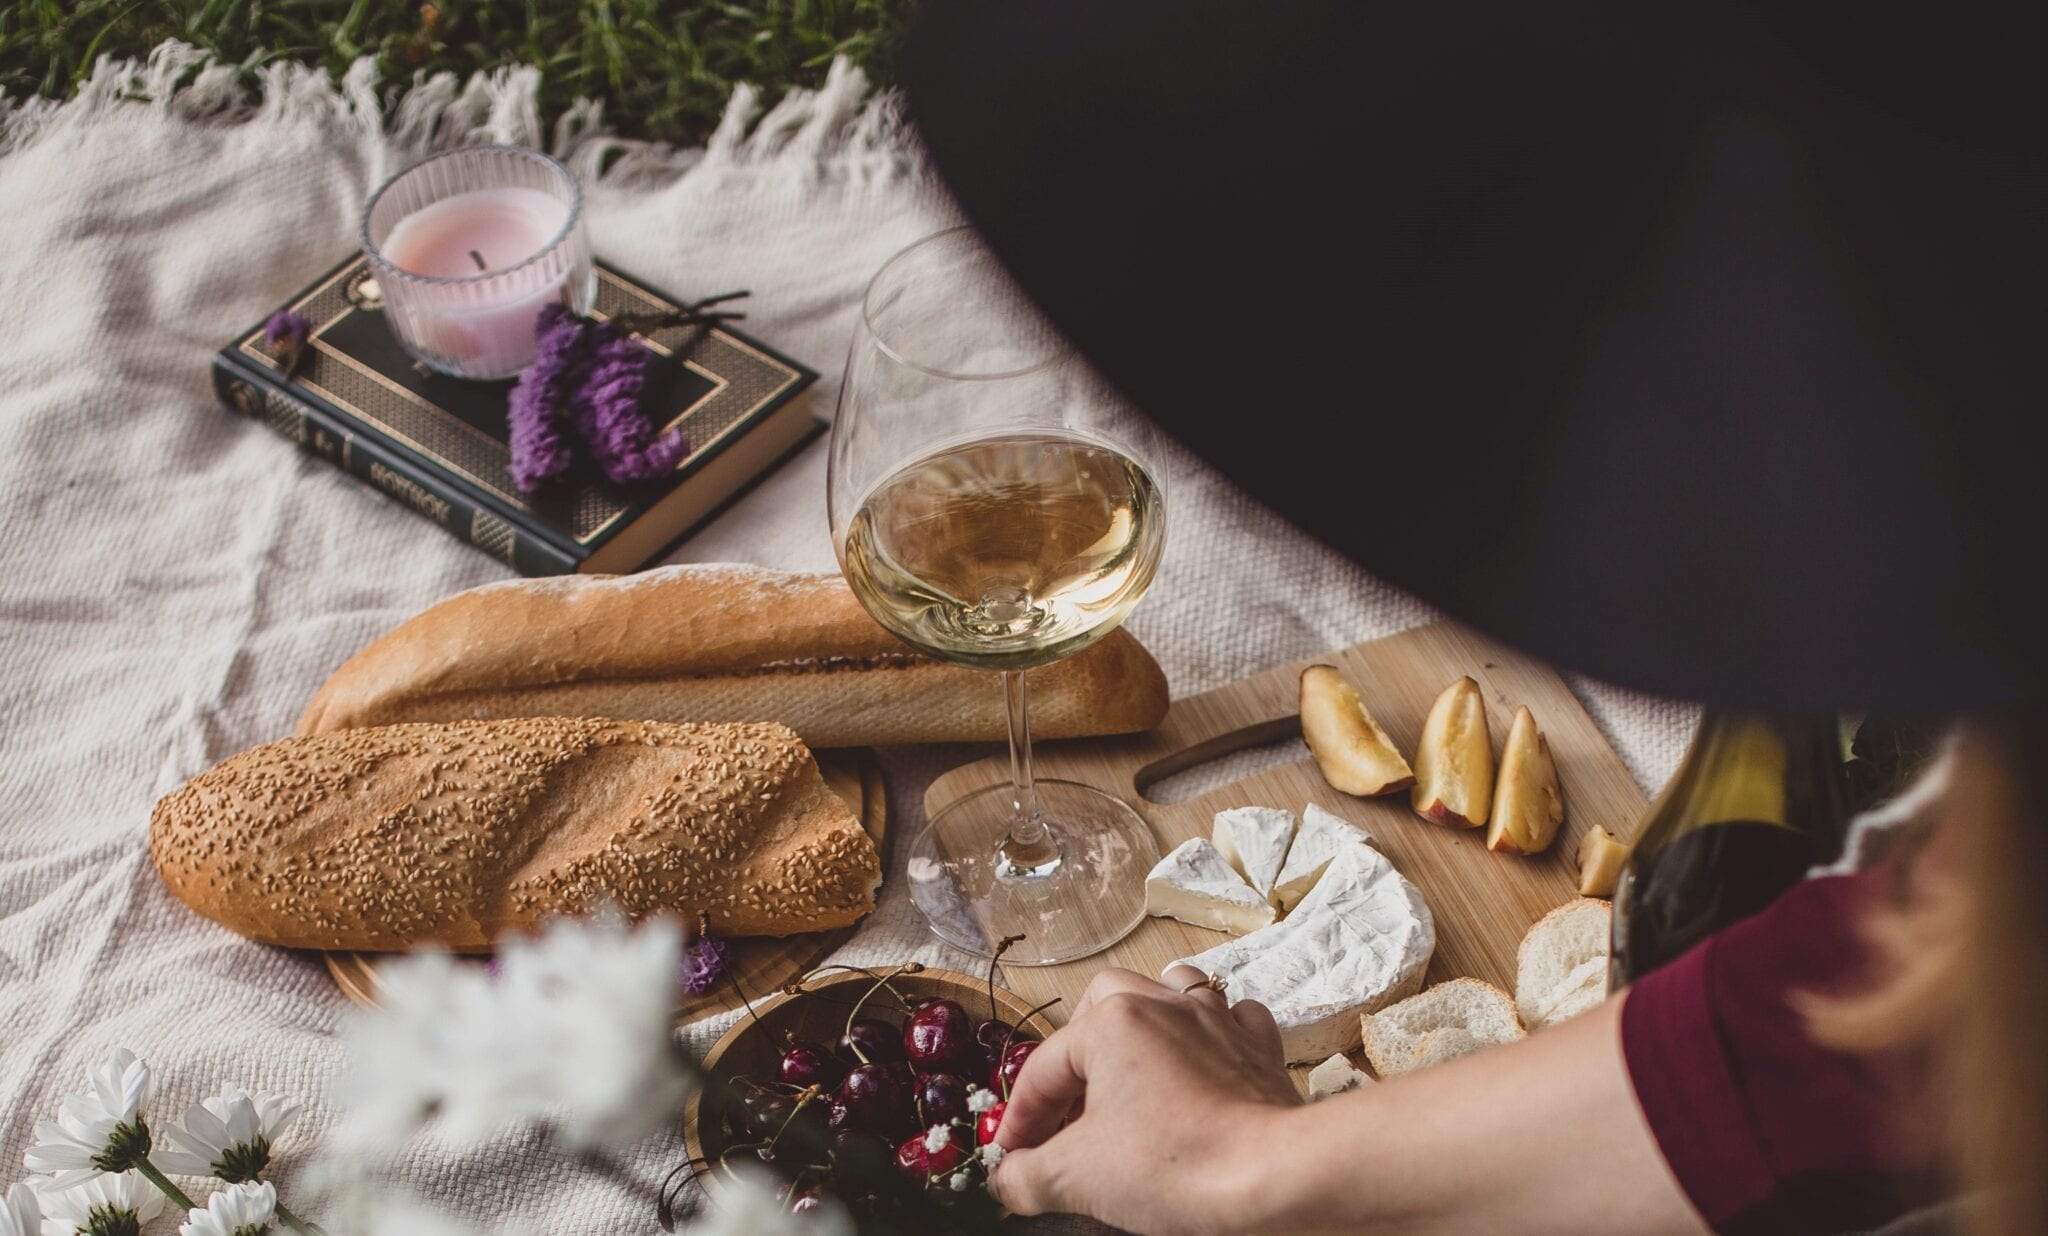 Wine picnic, reading, cheese, pairings. By Alexandra K, Unsplash